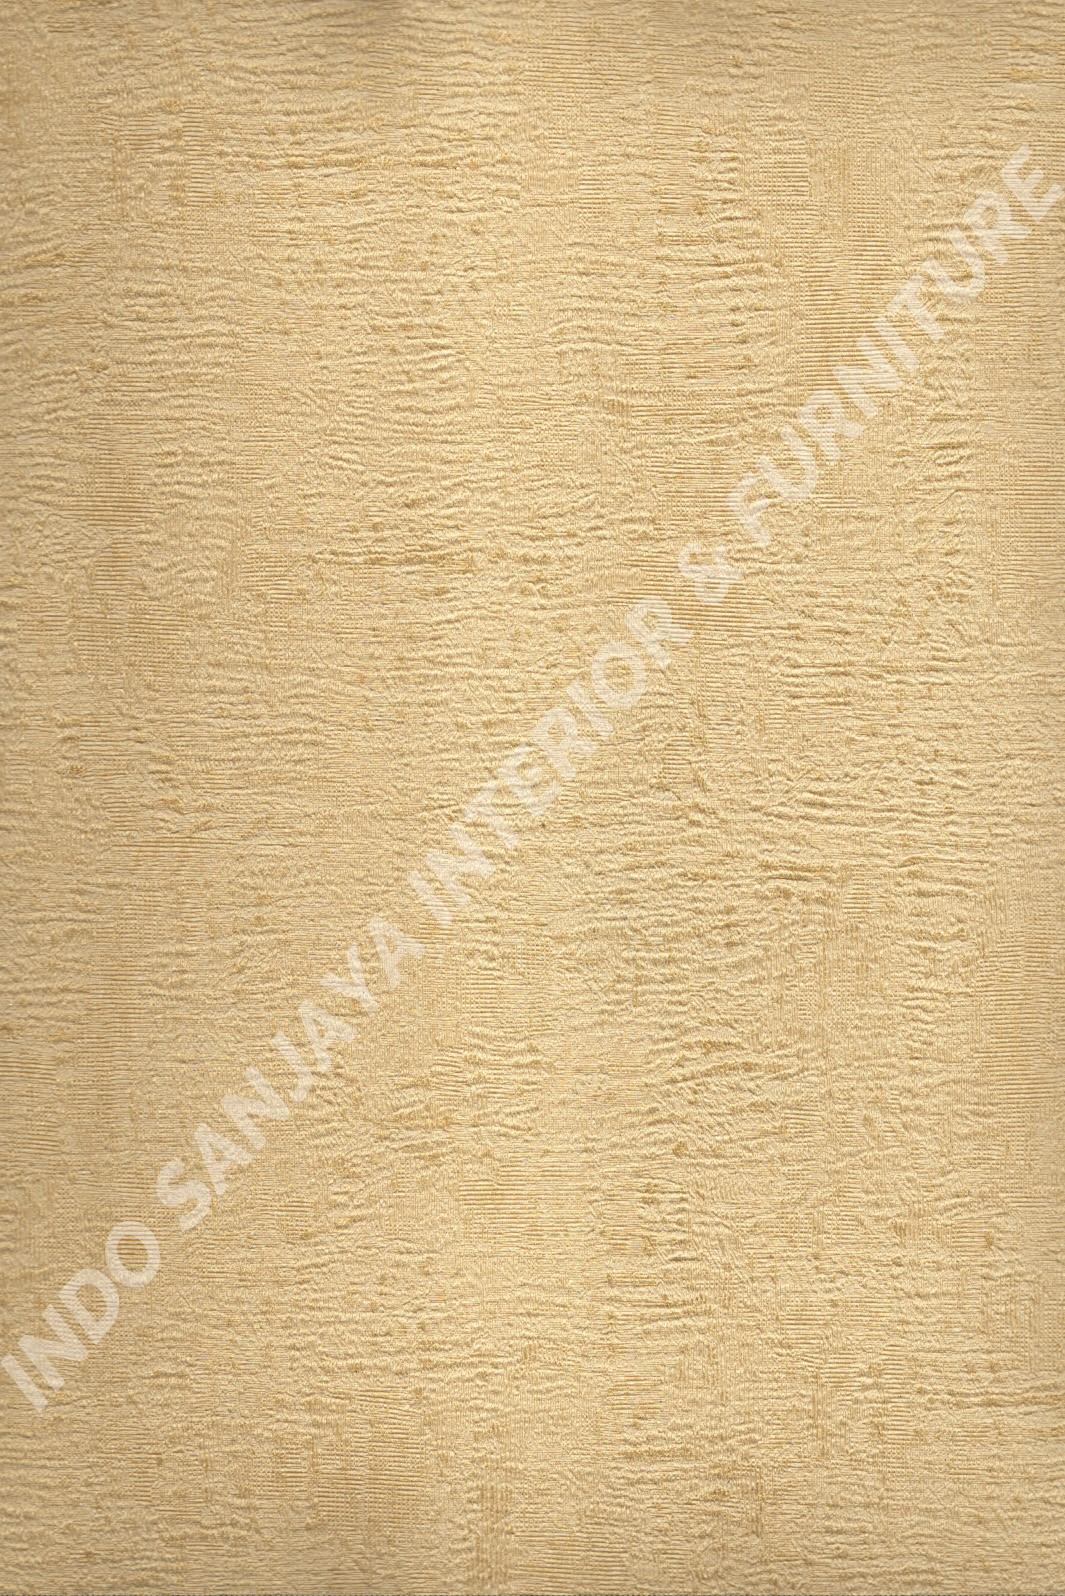 wallpaper   Wallpaper Minimalis Polos 51014-3:51014-3 corak  warna